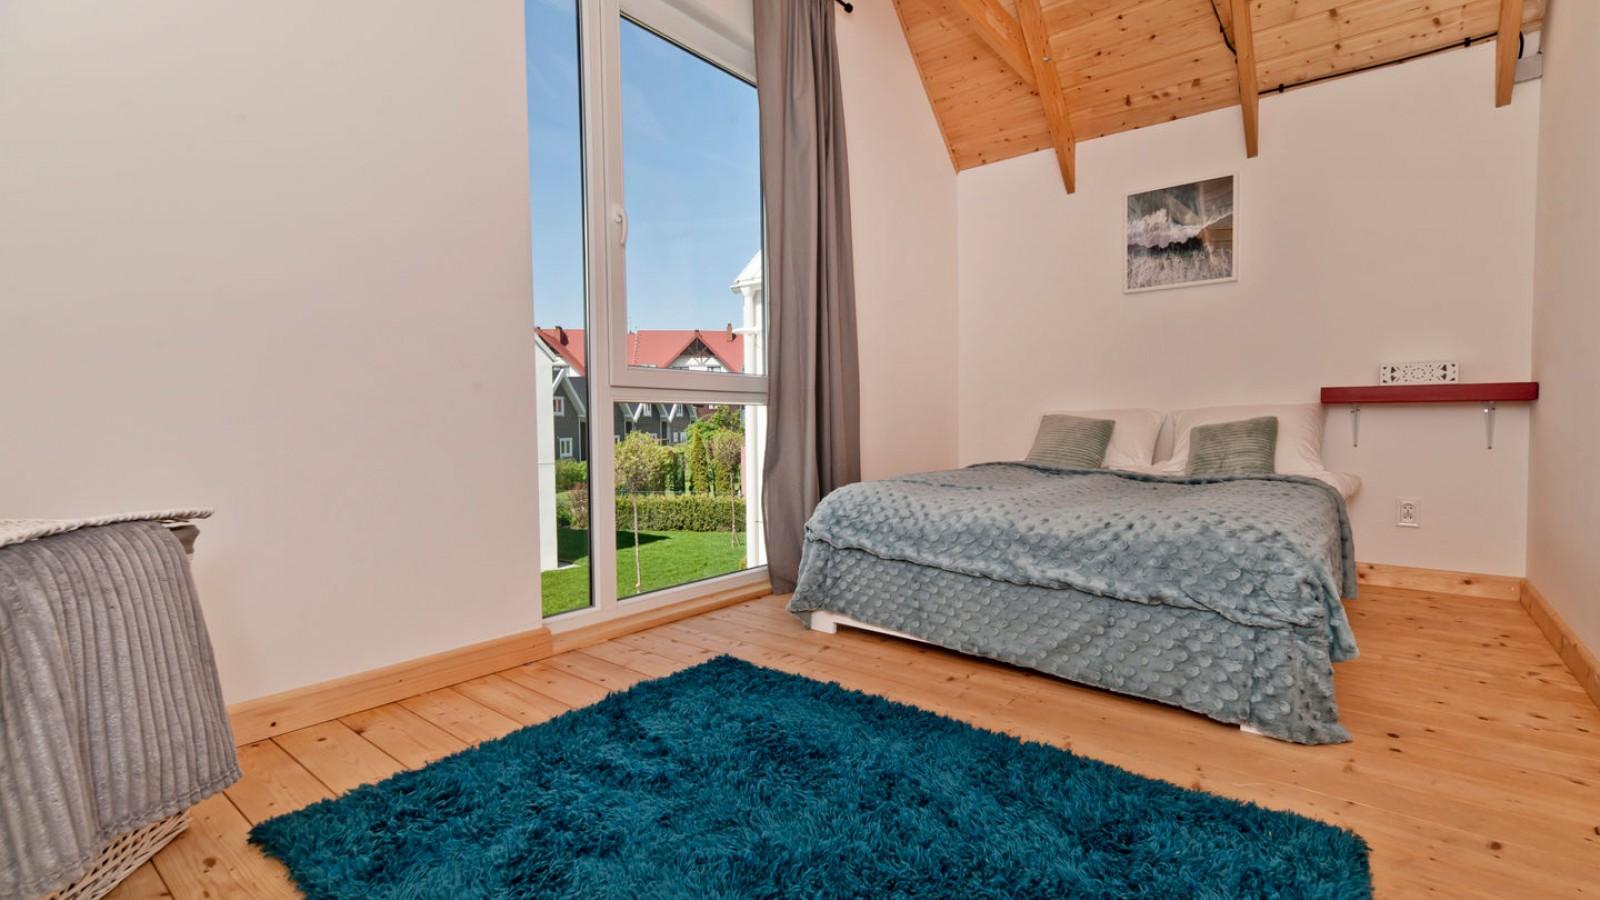 Domek Apartamentowy Scandi 4